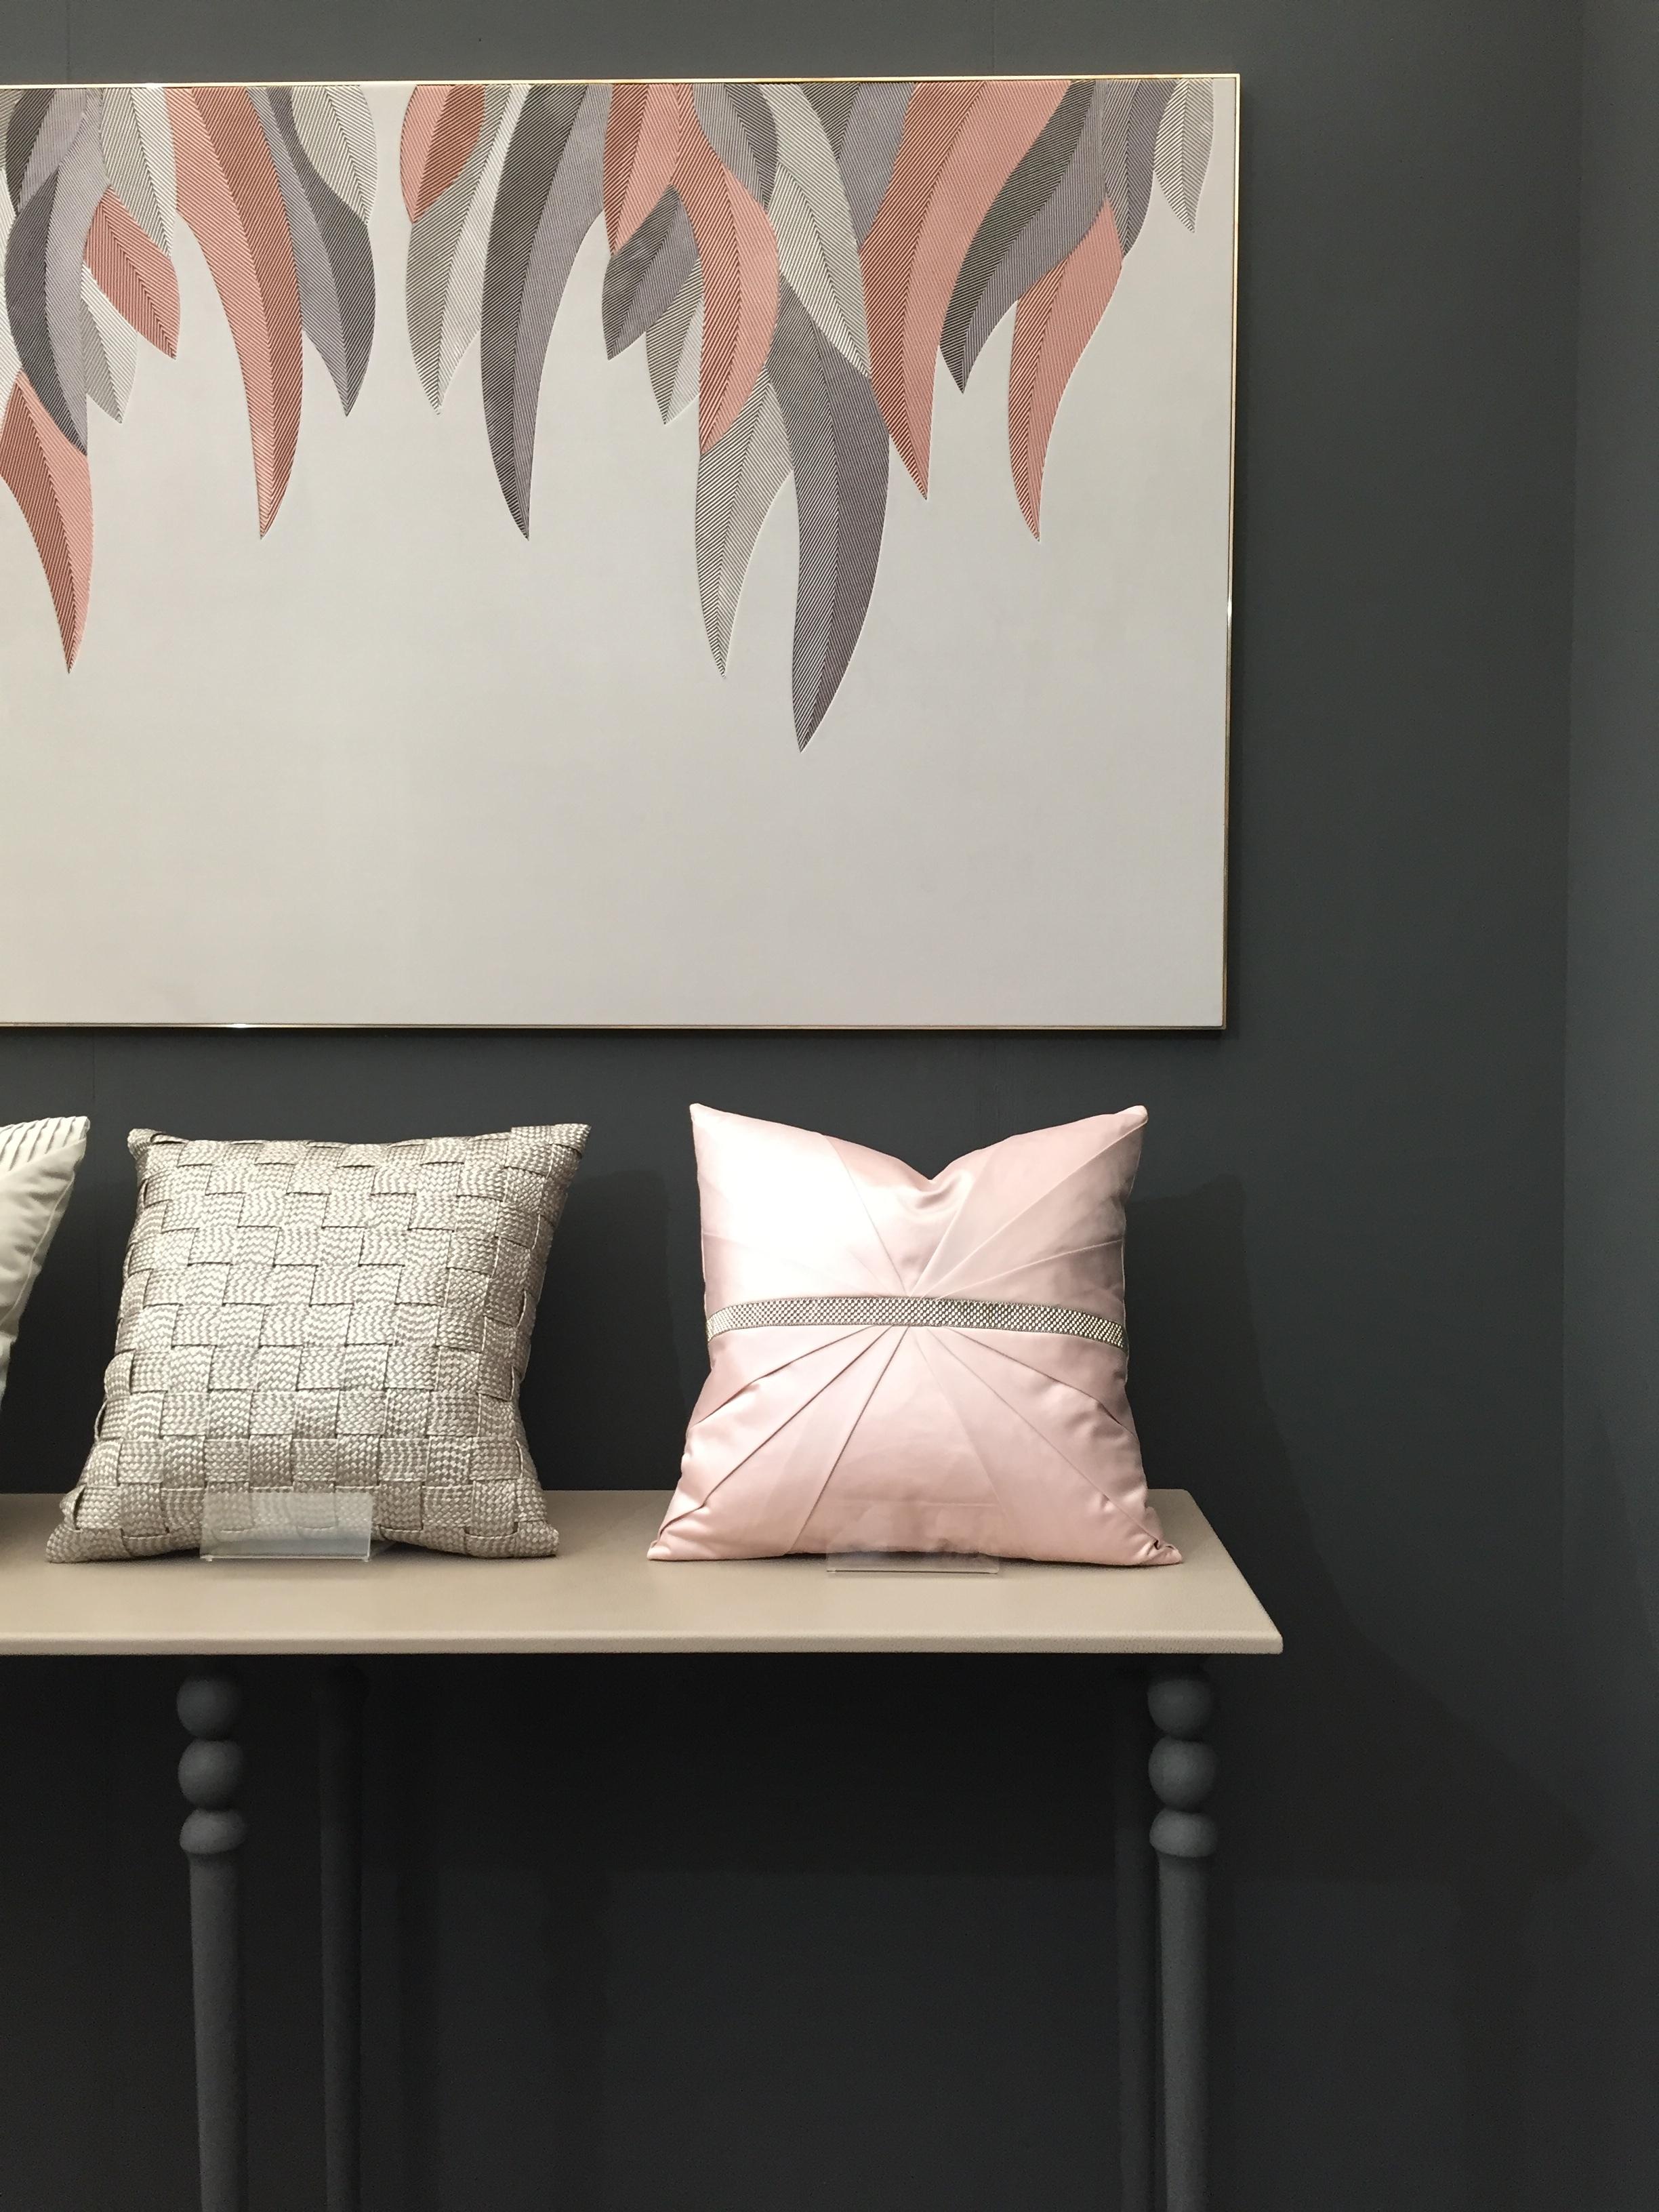 Decorex 2016 - Shades of pink of specialist luxury upholstery Aiveen Daly | Masha Shapiro Agency.JPG